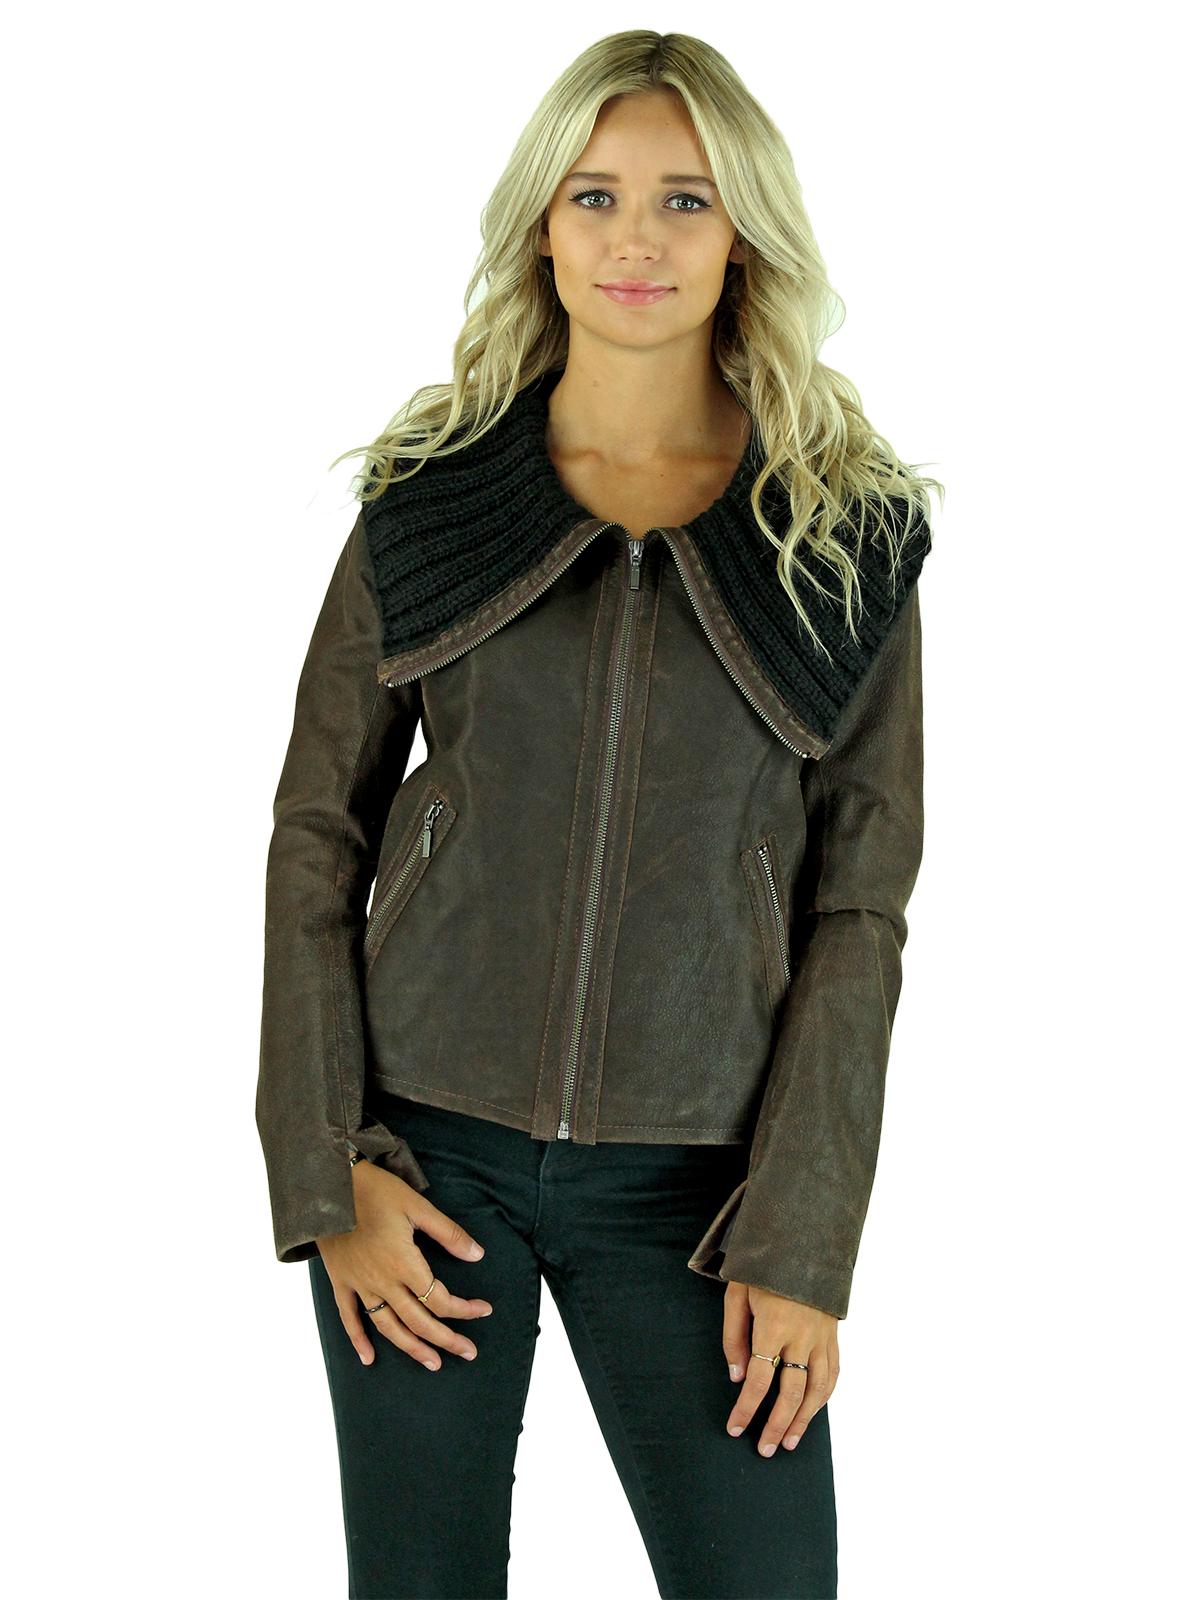 Woman's Petite Dark Chocolate Brown Leather Jacket